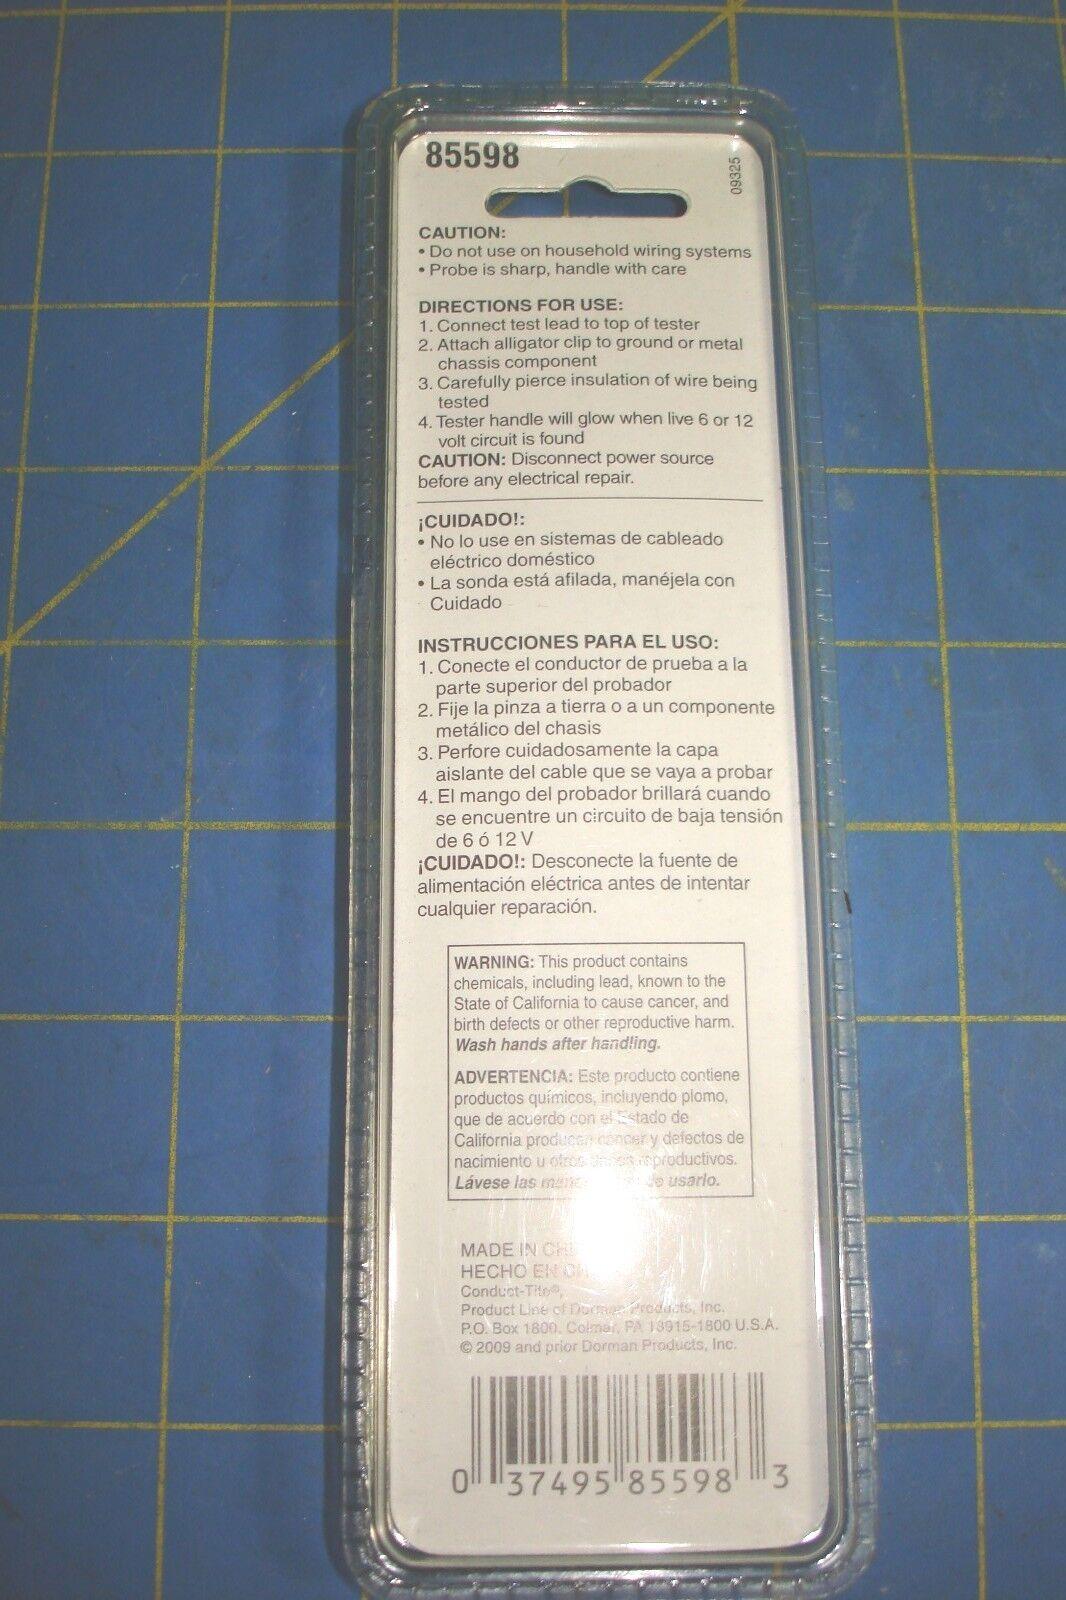 Circuit Tester 6 or 12 Volt Dorman 85598 | eBay